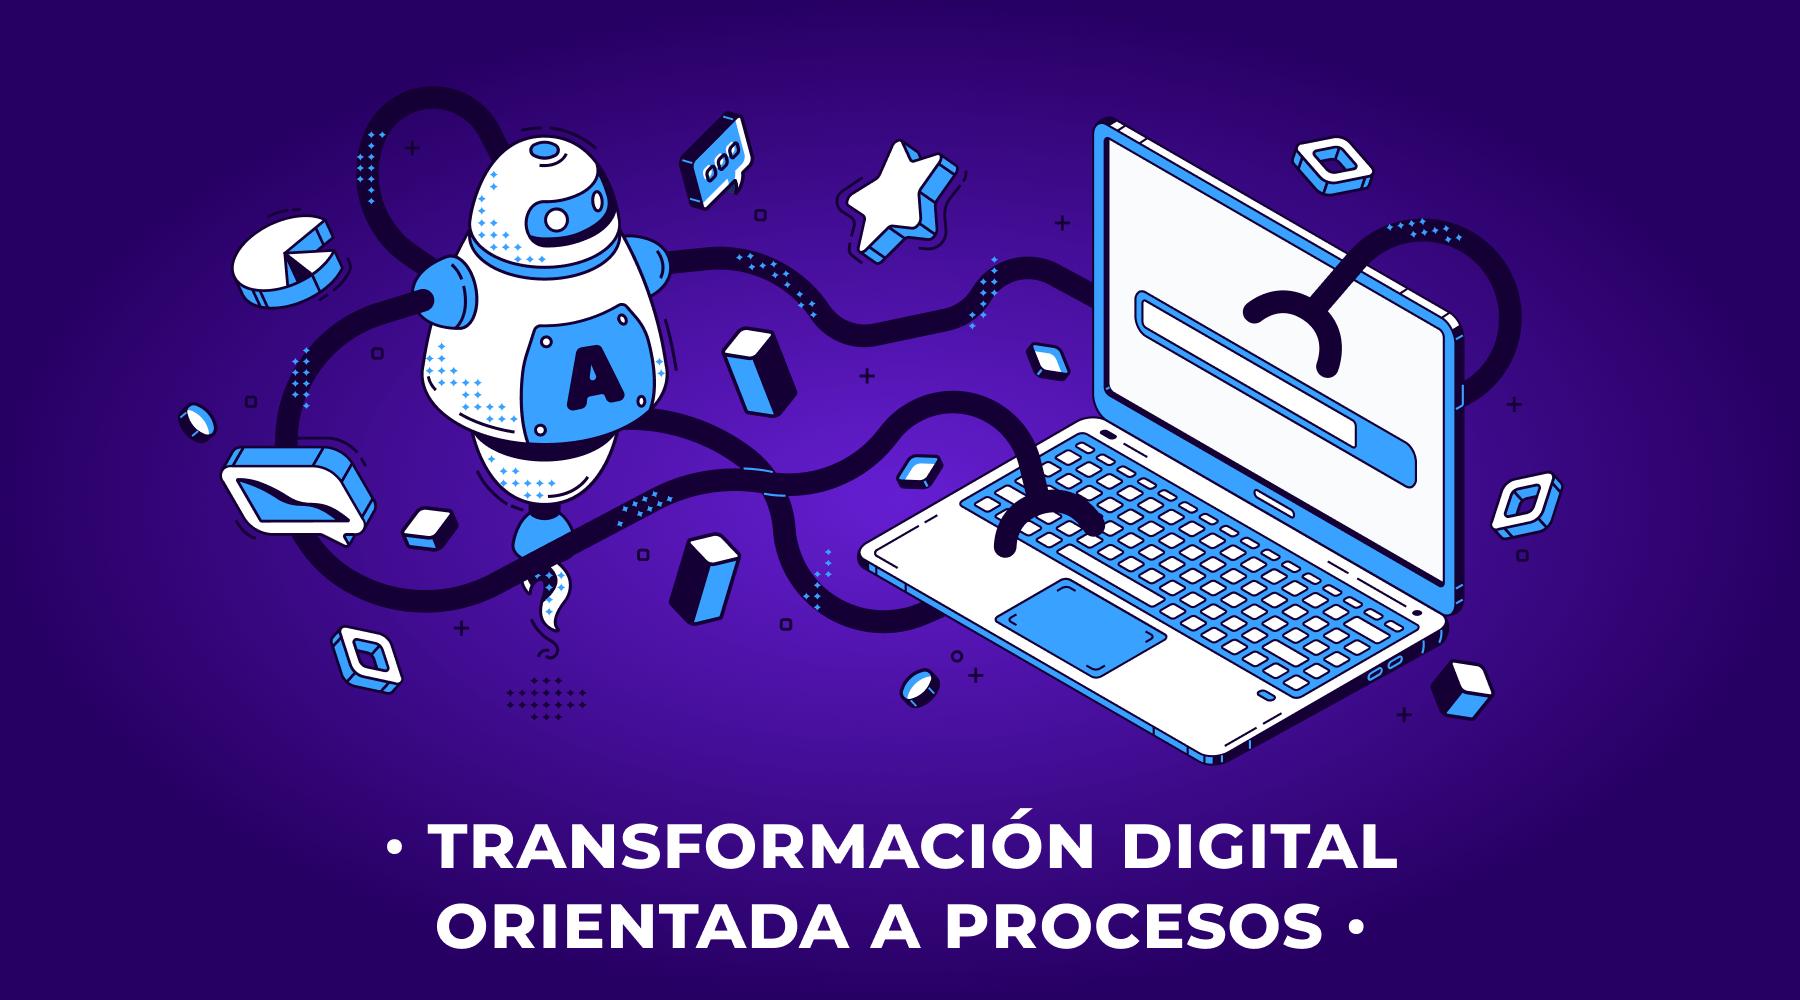 TheEye ¿Cómo encarar un proyecto de transformación digital orientada a procesos? Ailbirt para Prensario TI Latin America